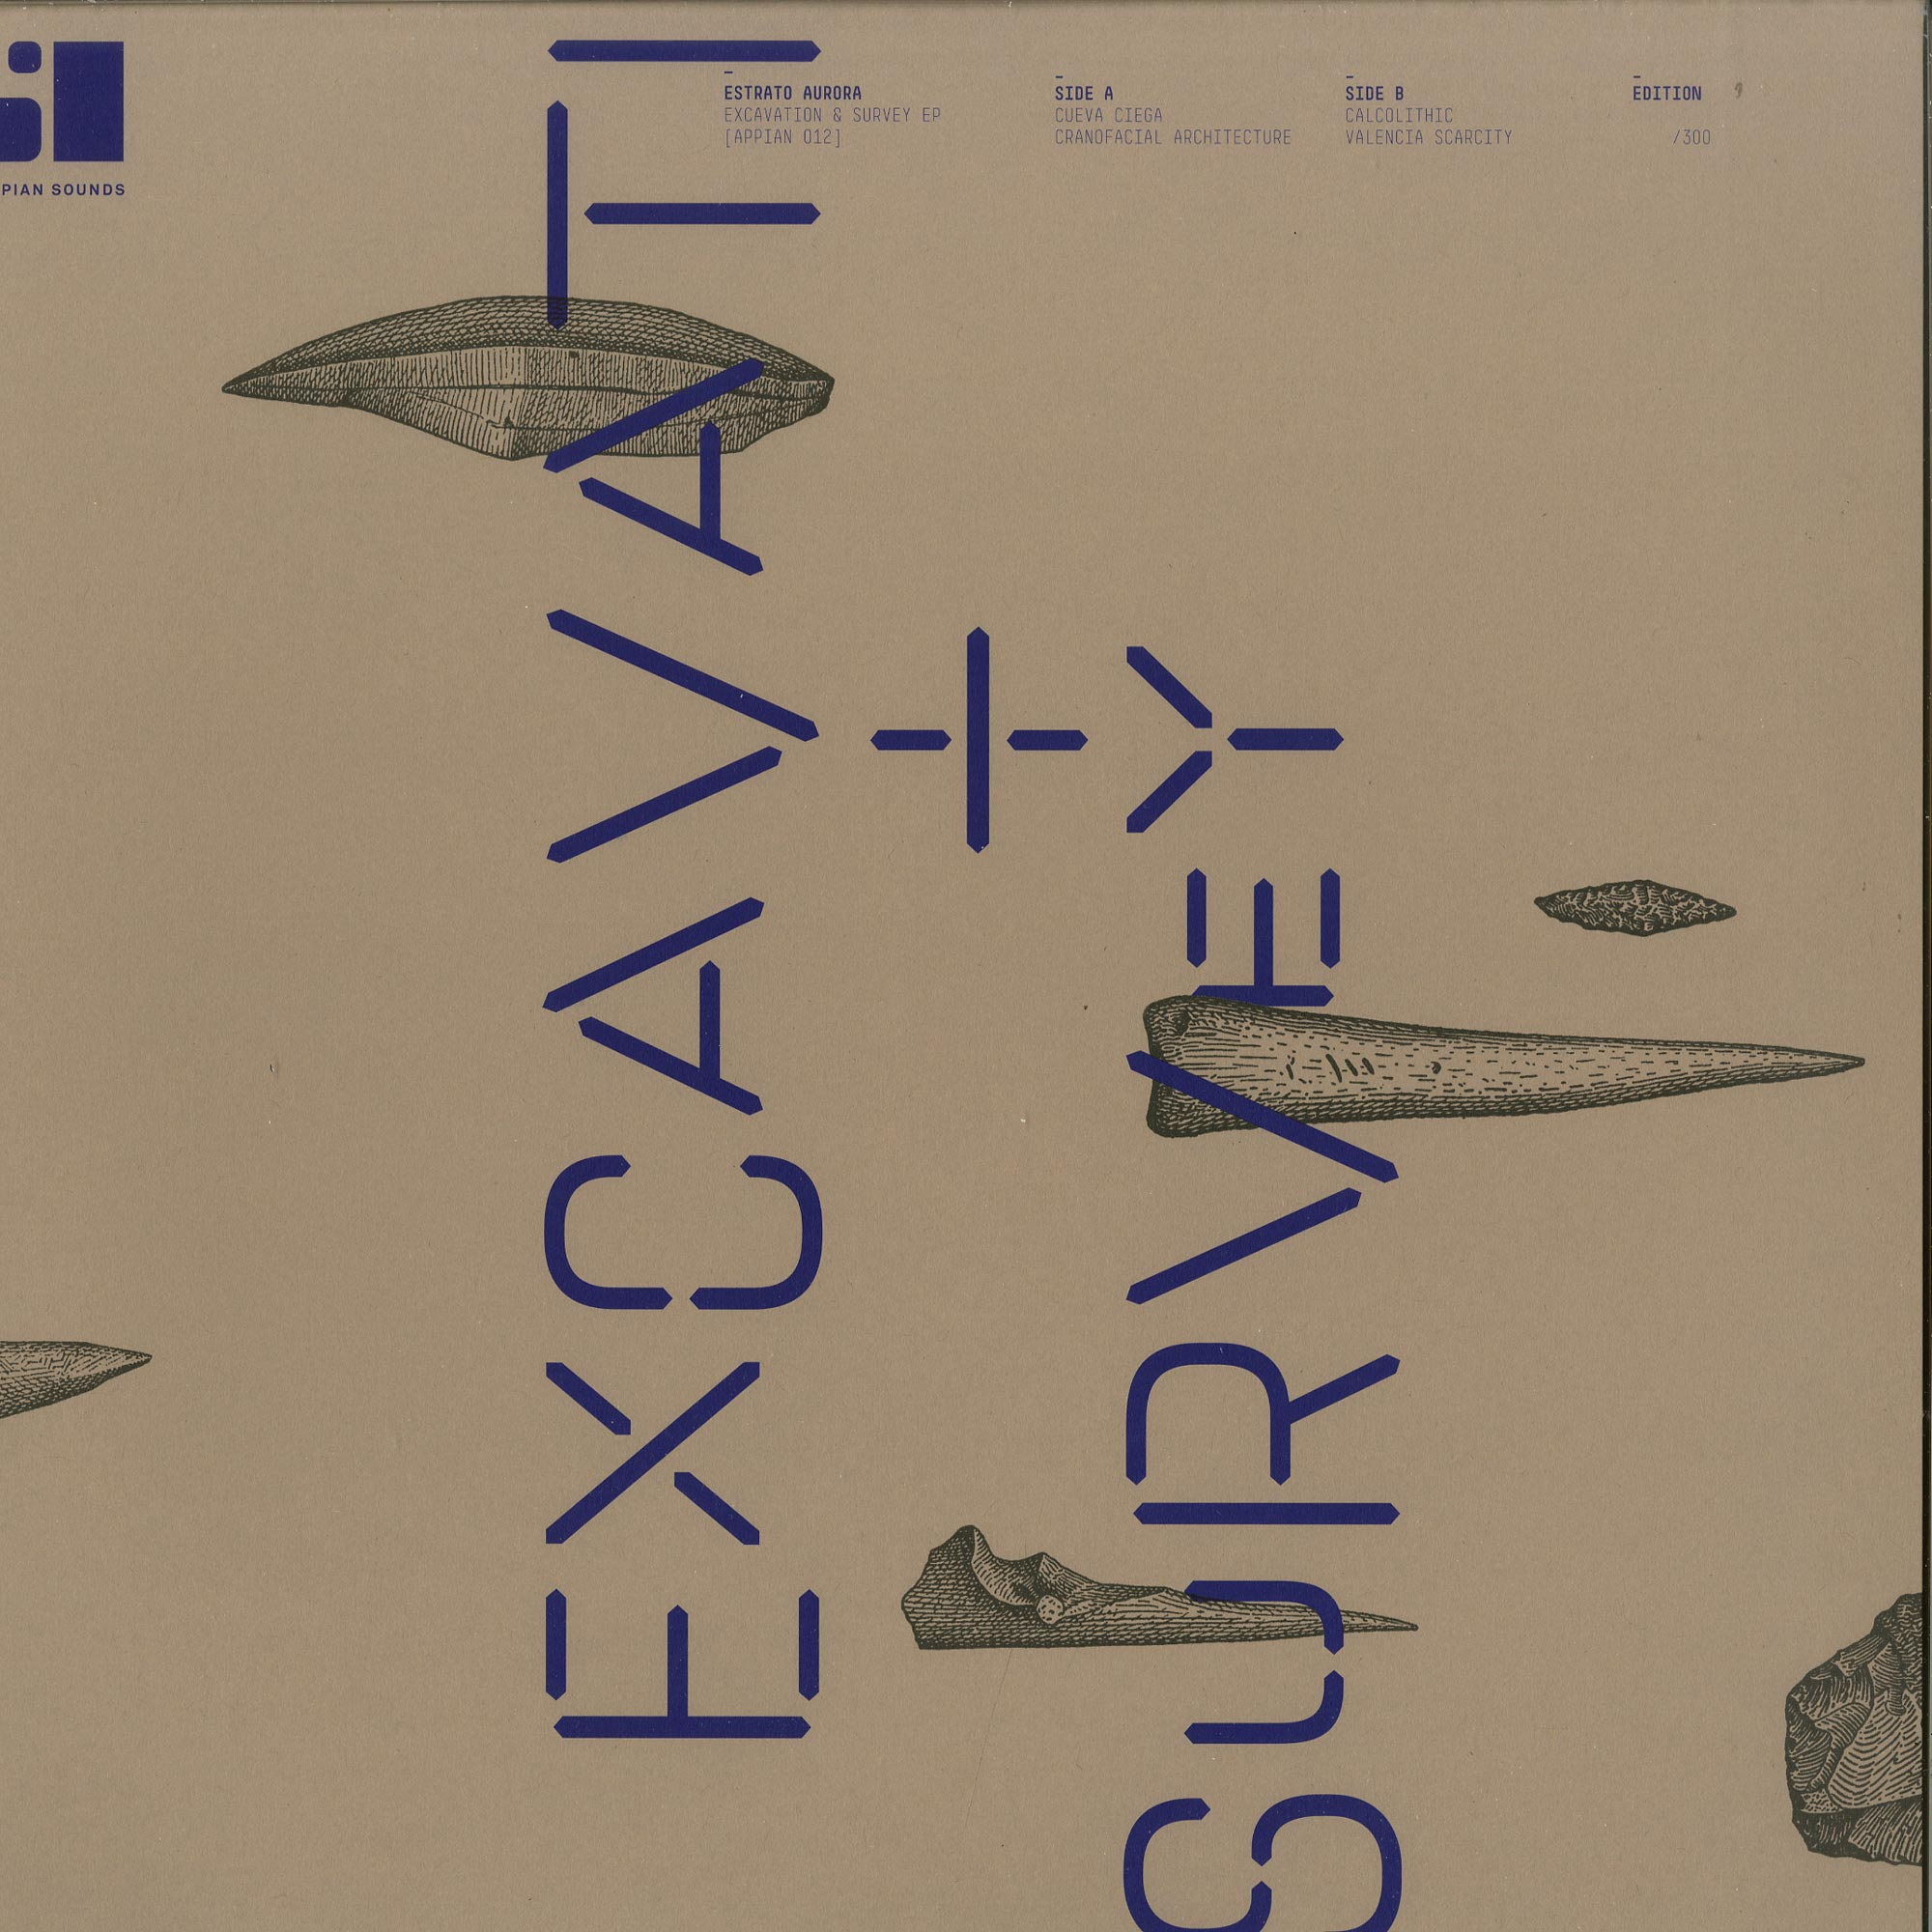 Estrato Aurora - EXCAVATION & SURVEY EP